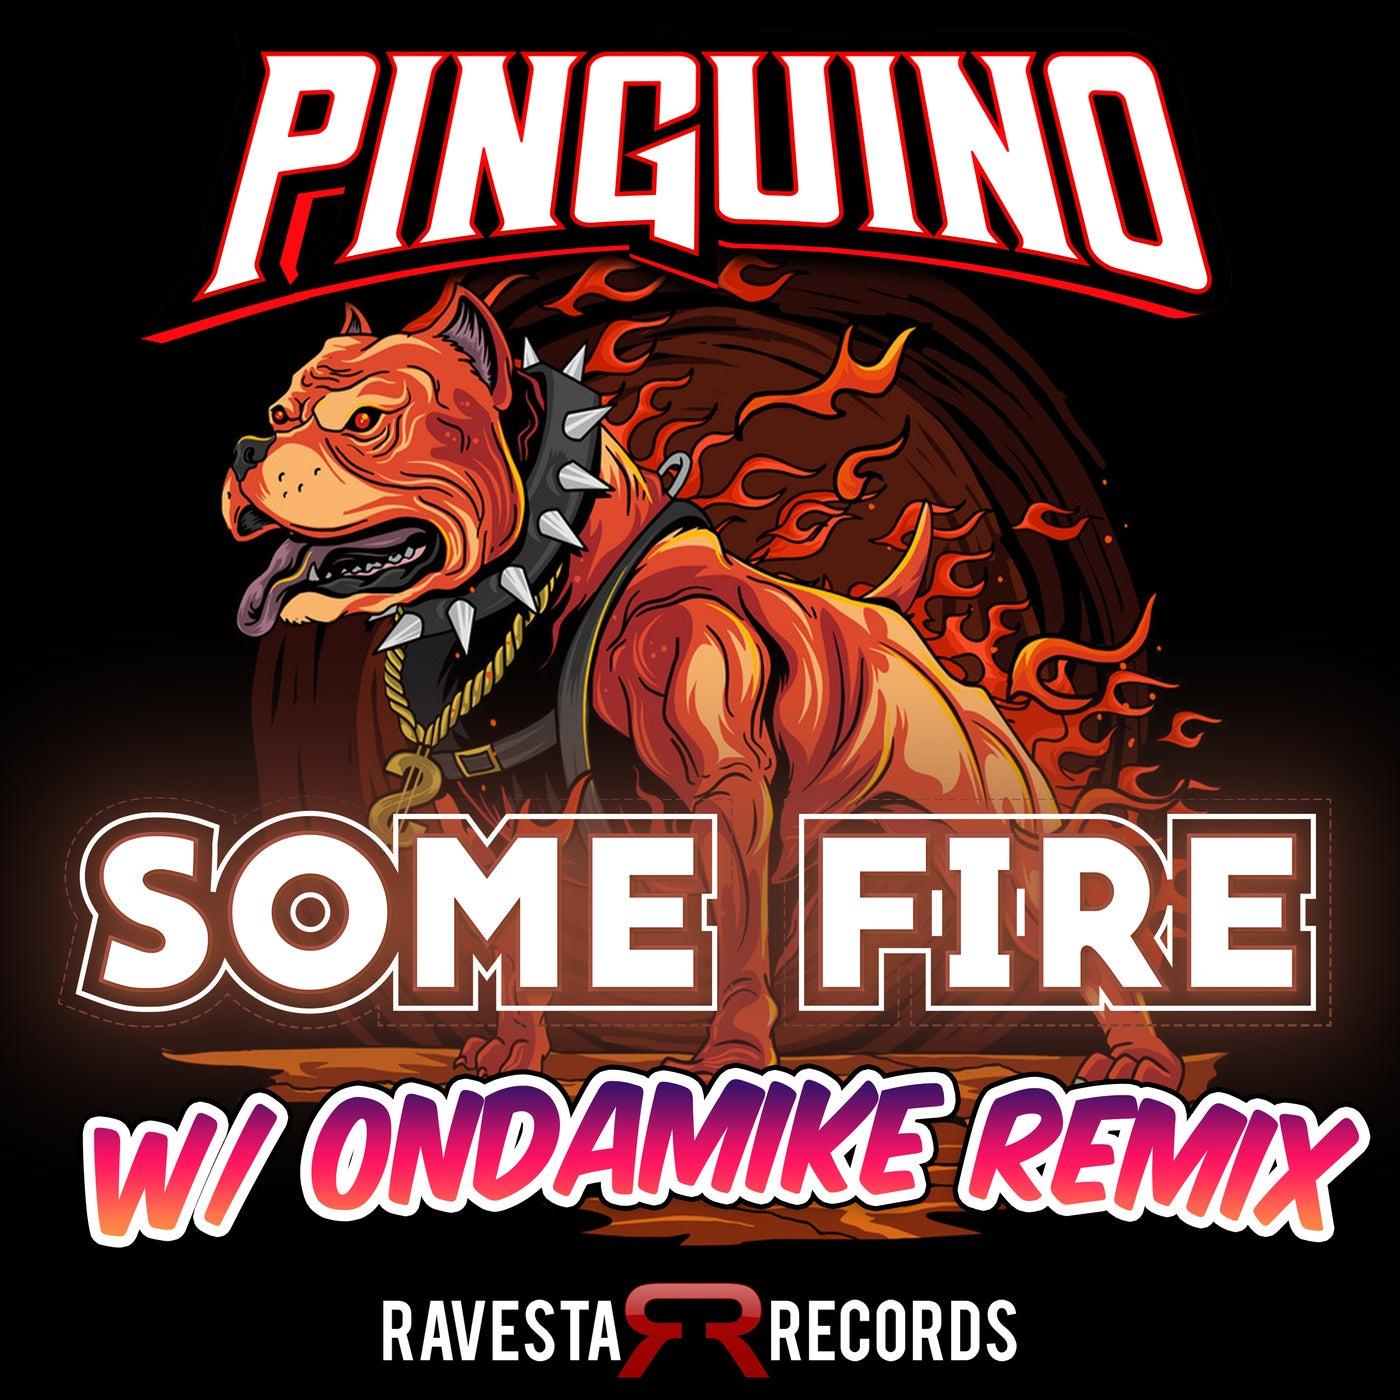 Some Fire (OnDaMiKe Remix)